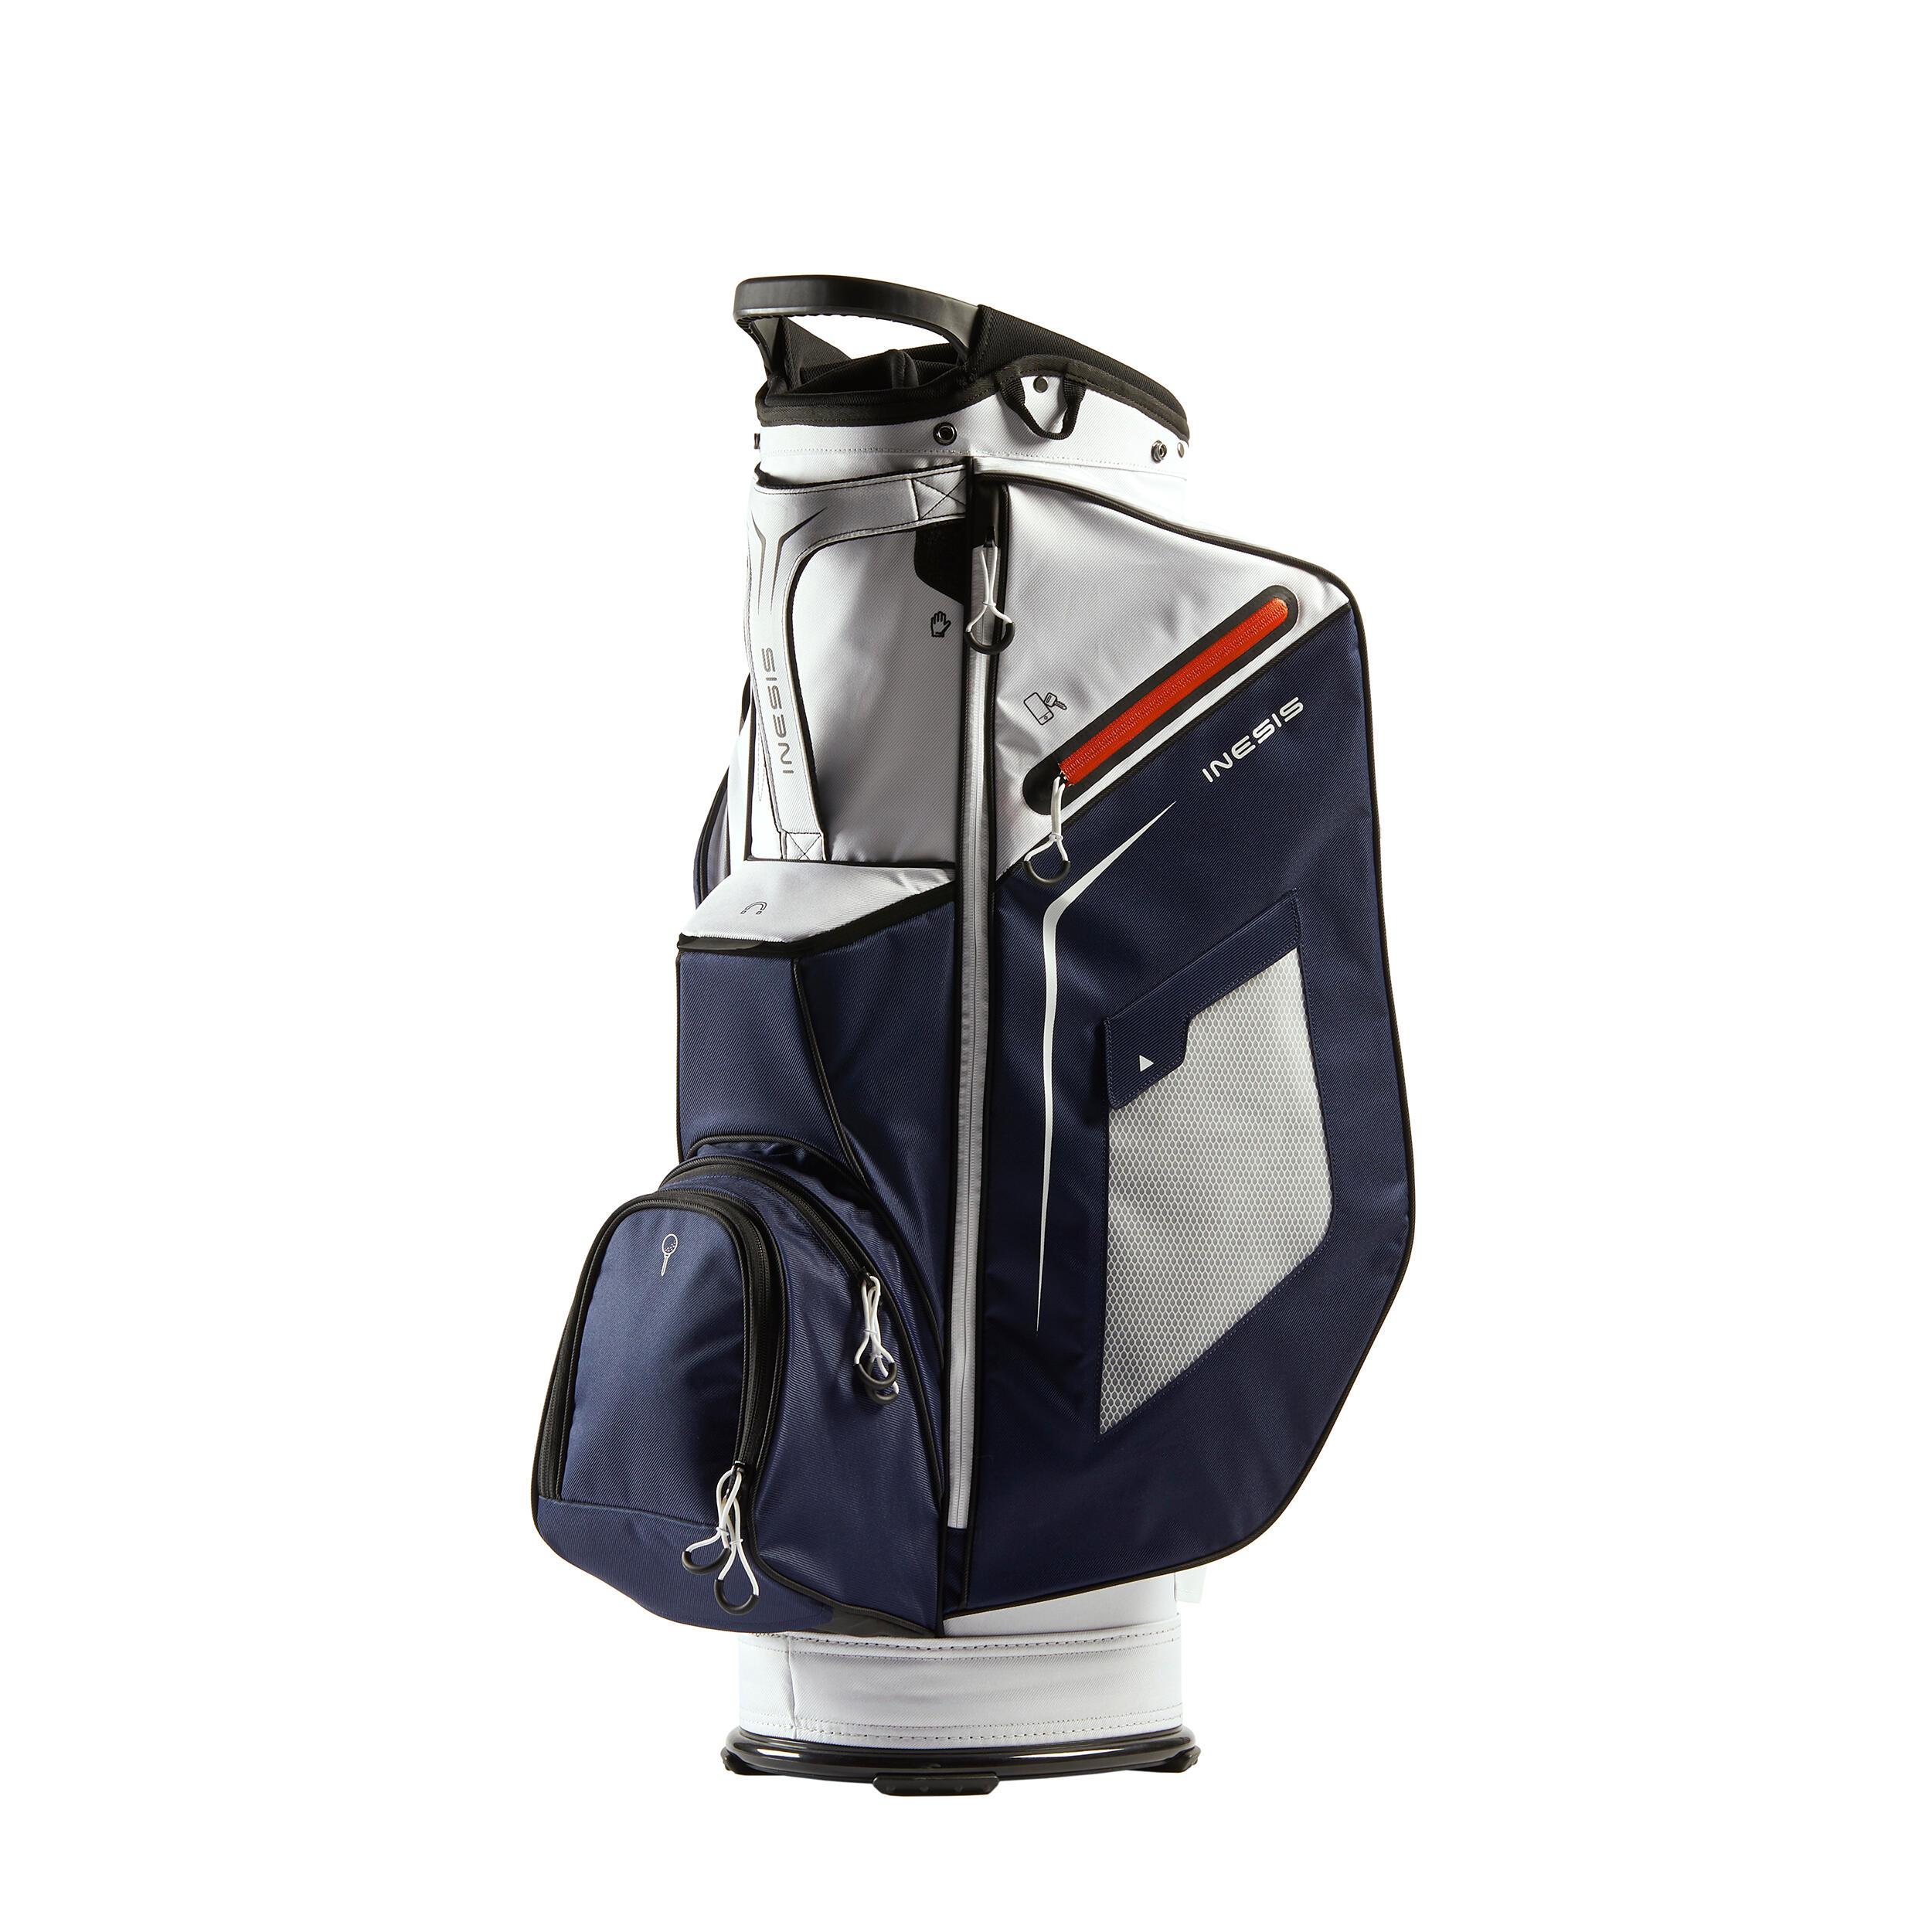 Inesis Cart Bag marineblauw/wit kopen